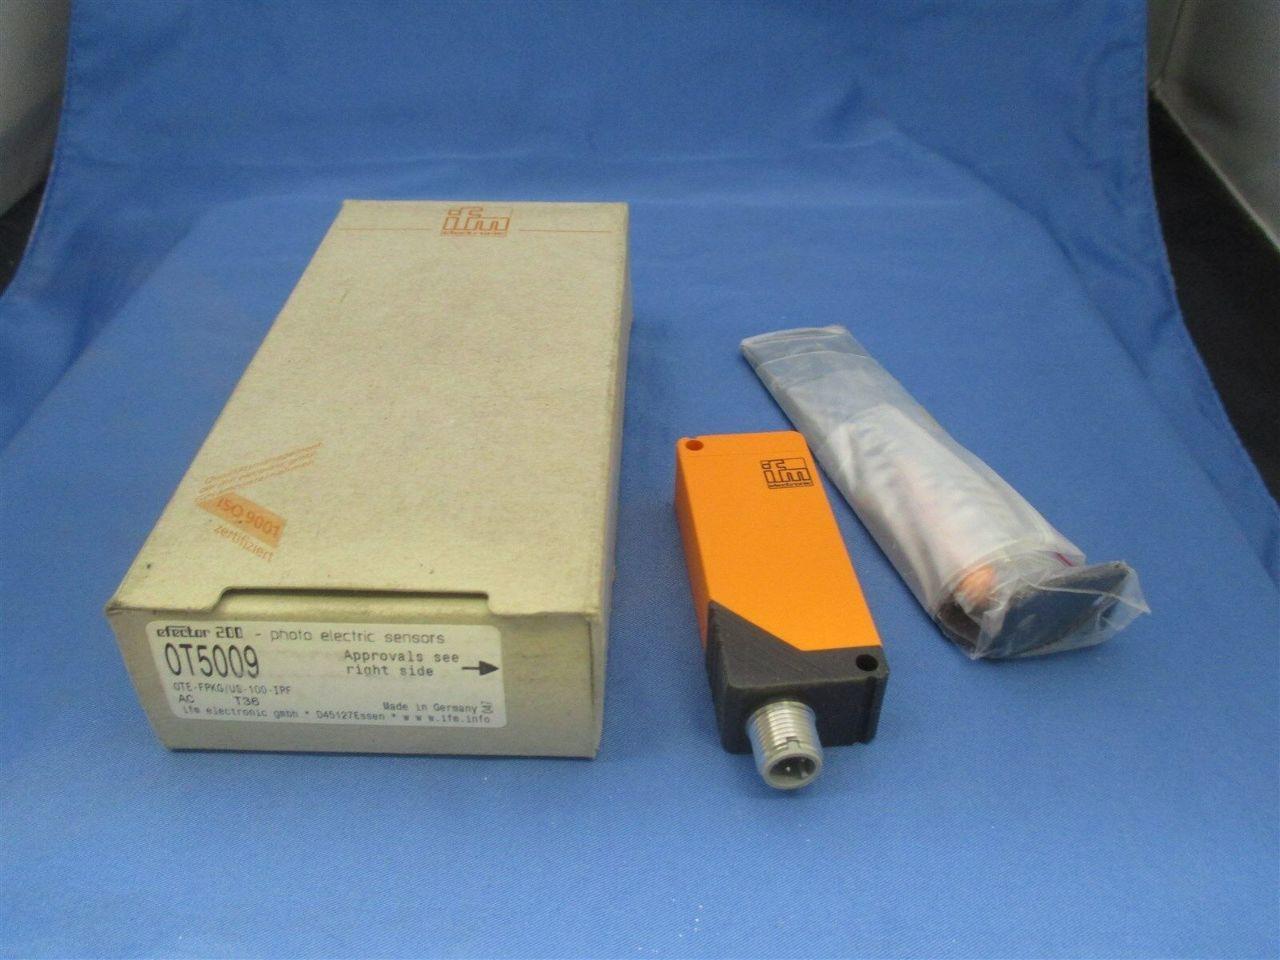 Ifm Efector Ot5009 Ote Fpkg Us 100 Ipf Photoelectric